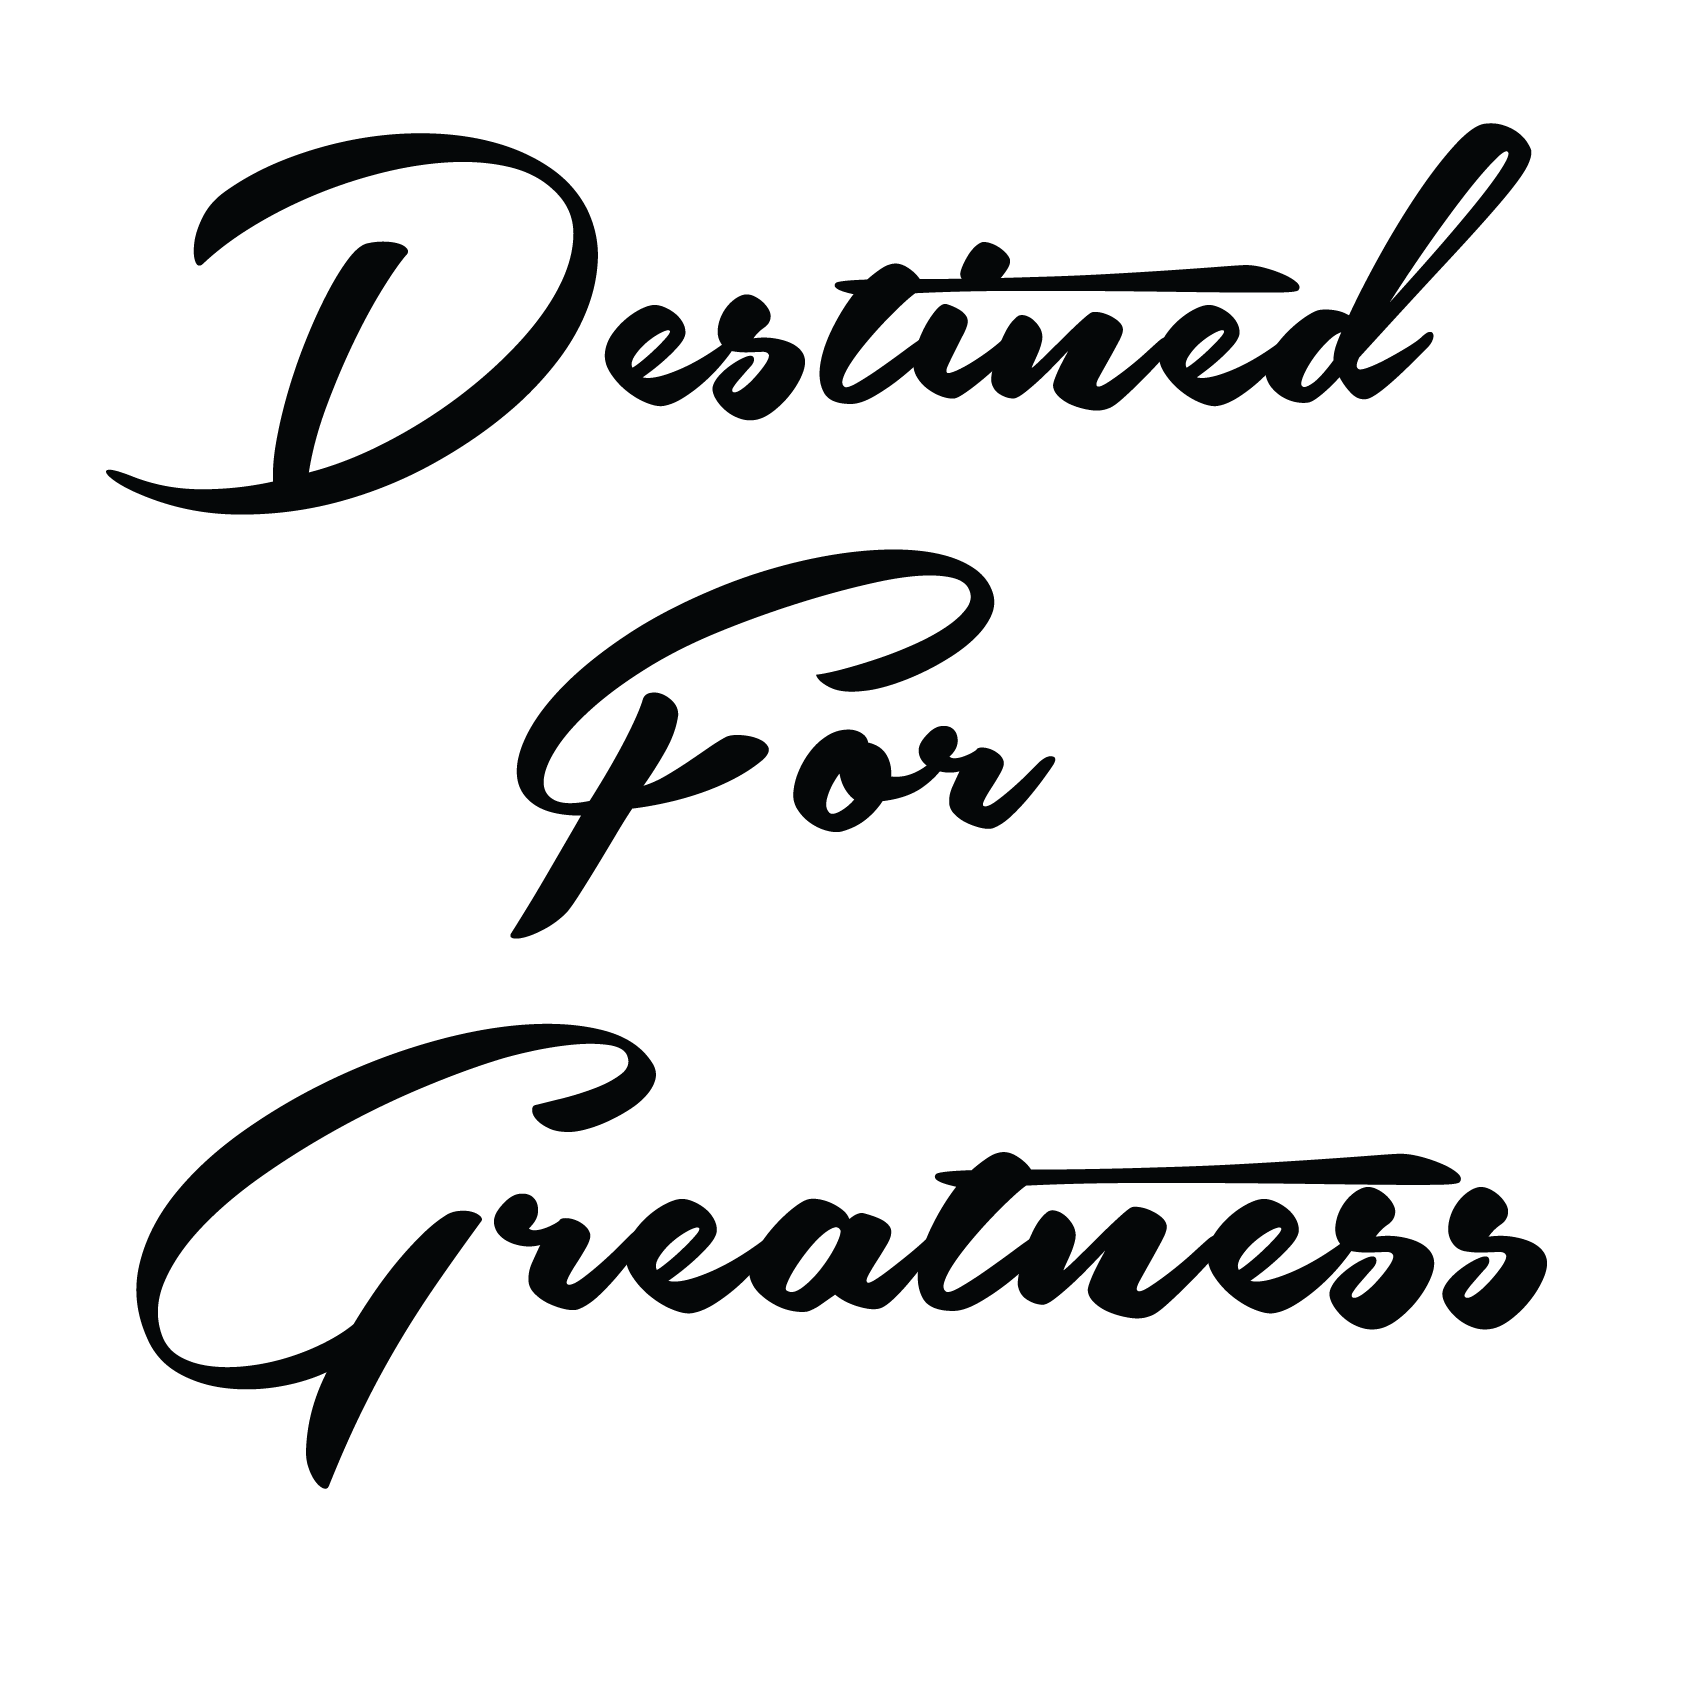 GetBetter Stickers messages sticker-4